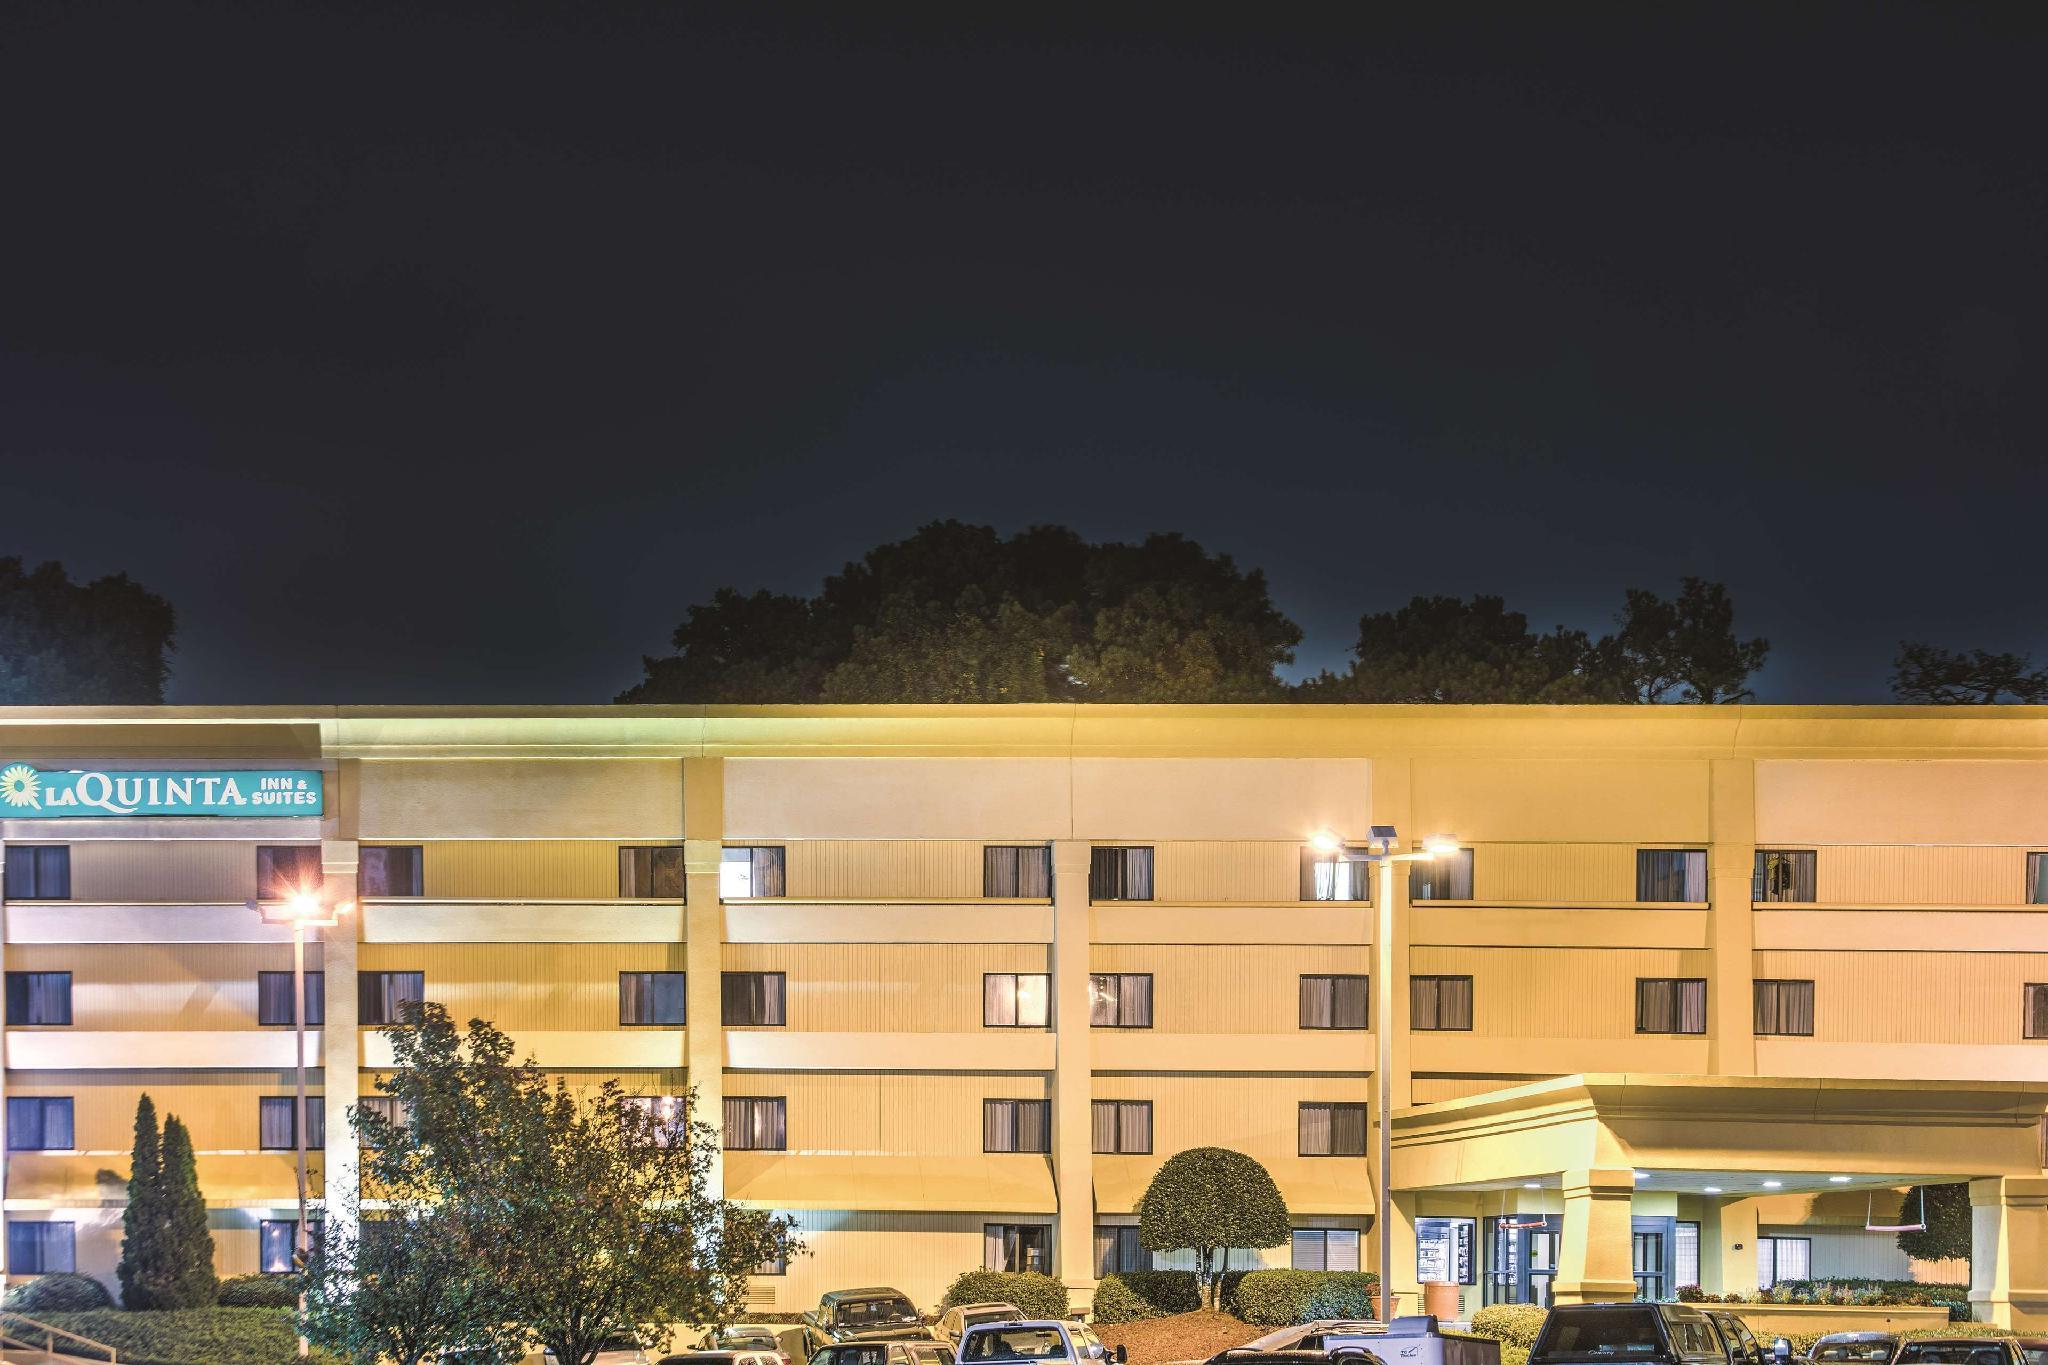 La Quinta Inn And Suites By Wyndham Atlanta Roswell